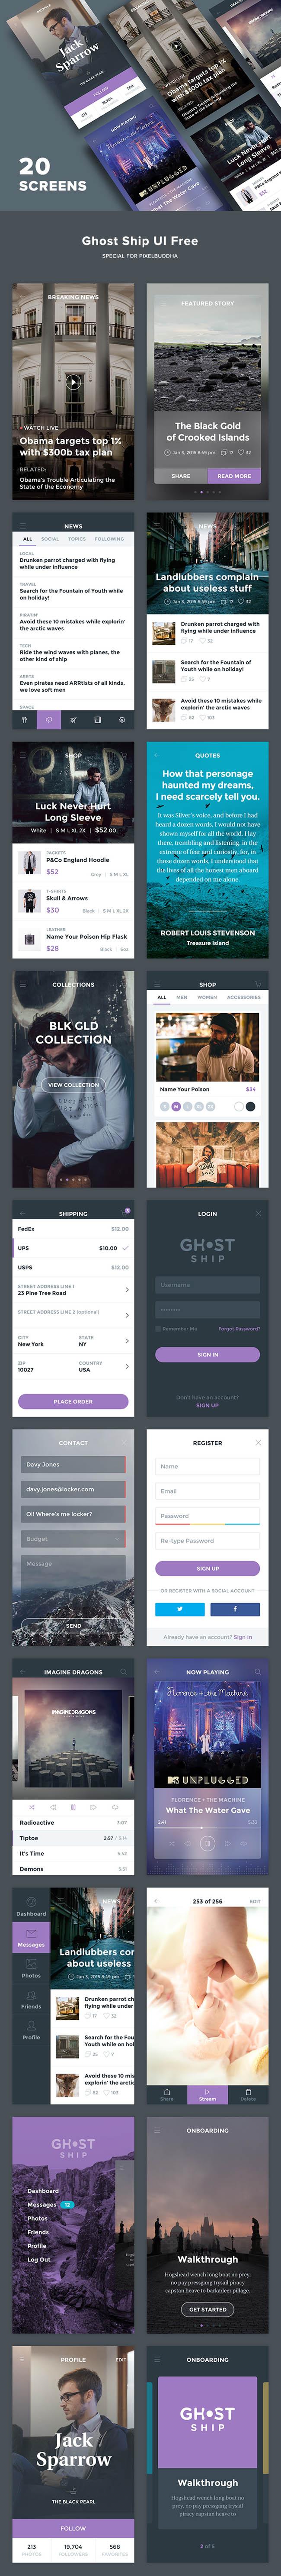 Ghost-Ship-Mobile-UI-Kit